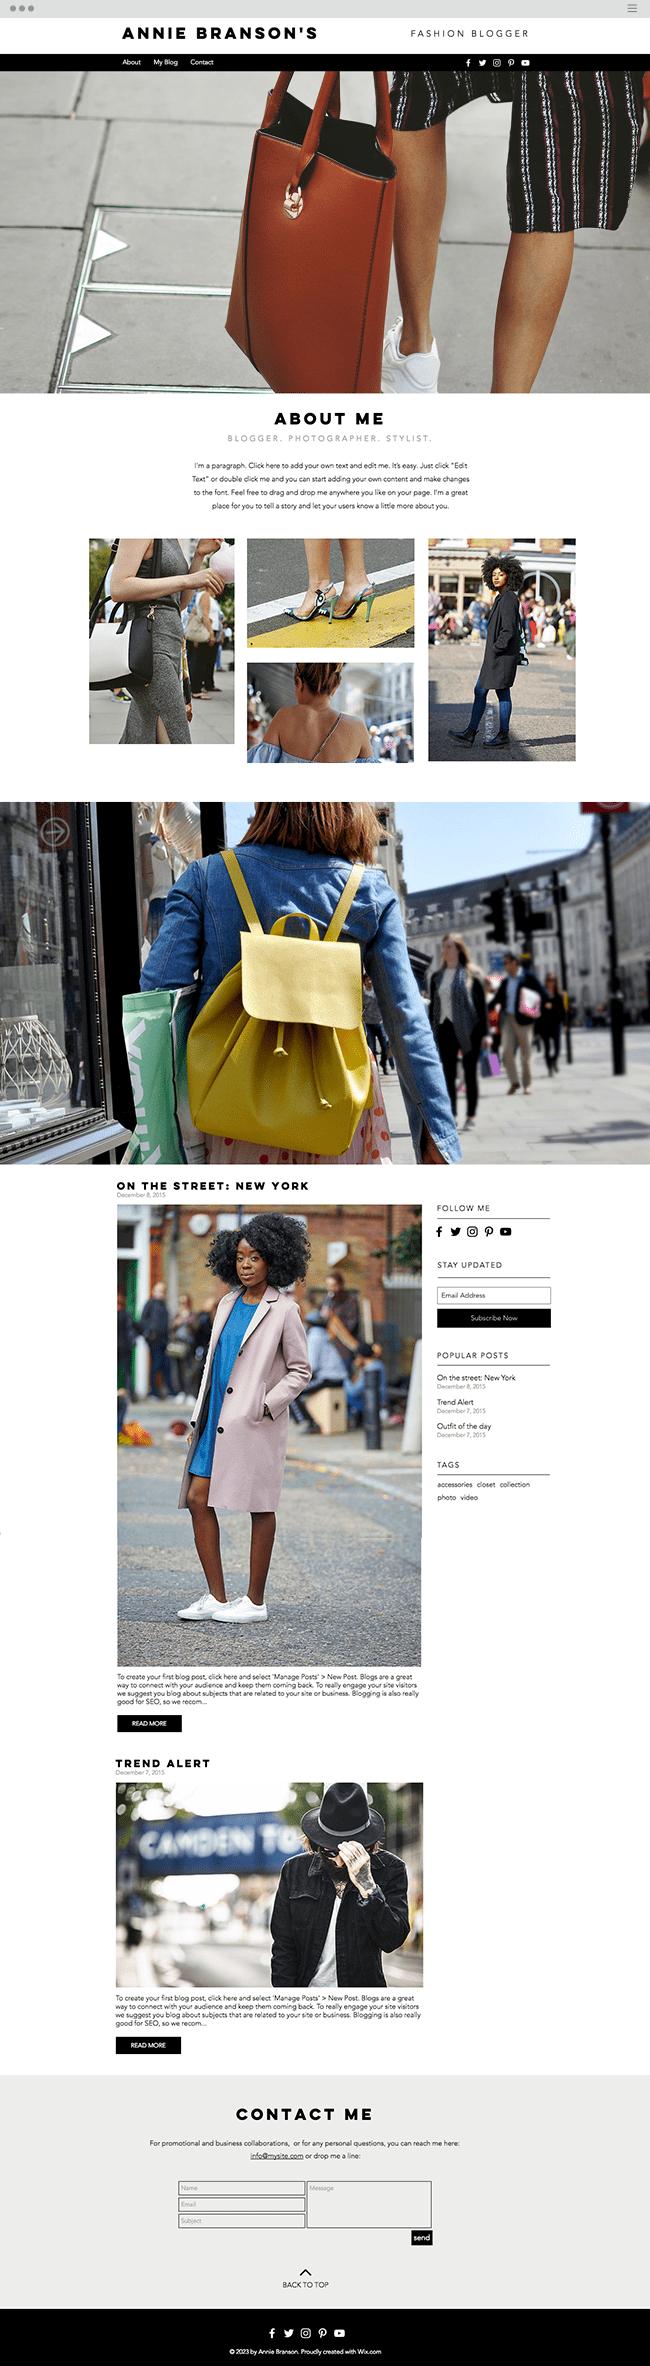 Street Fashion Blog Website Template WIX